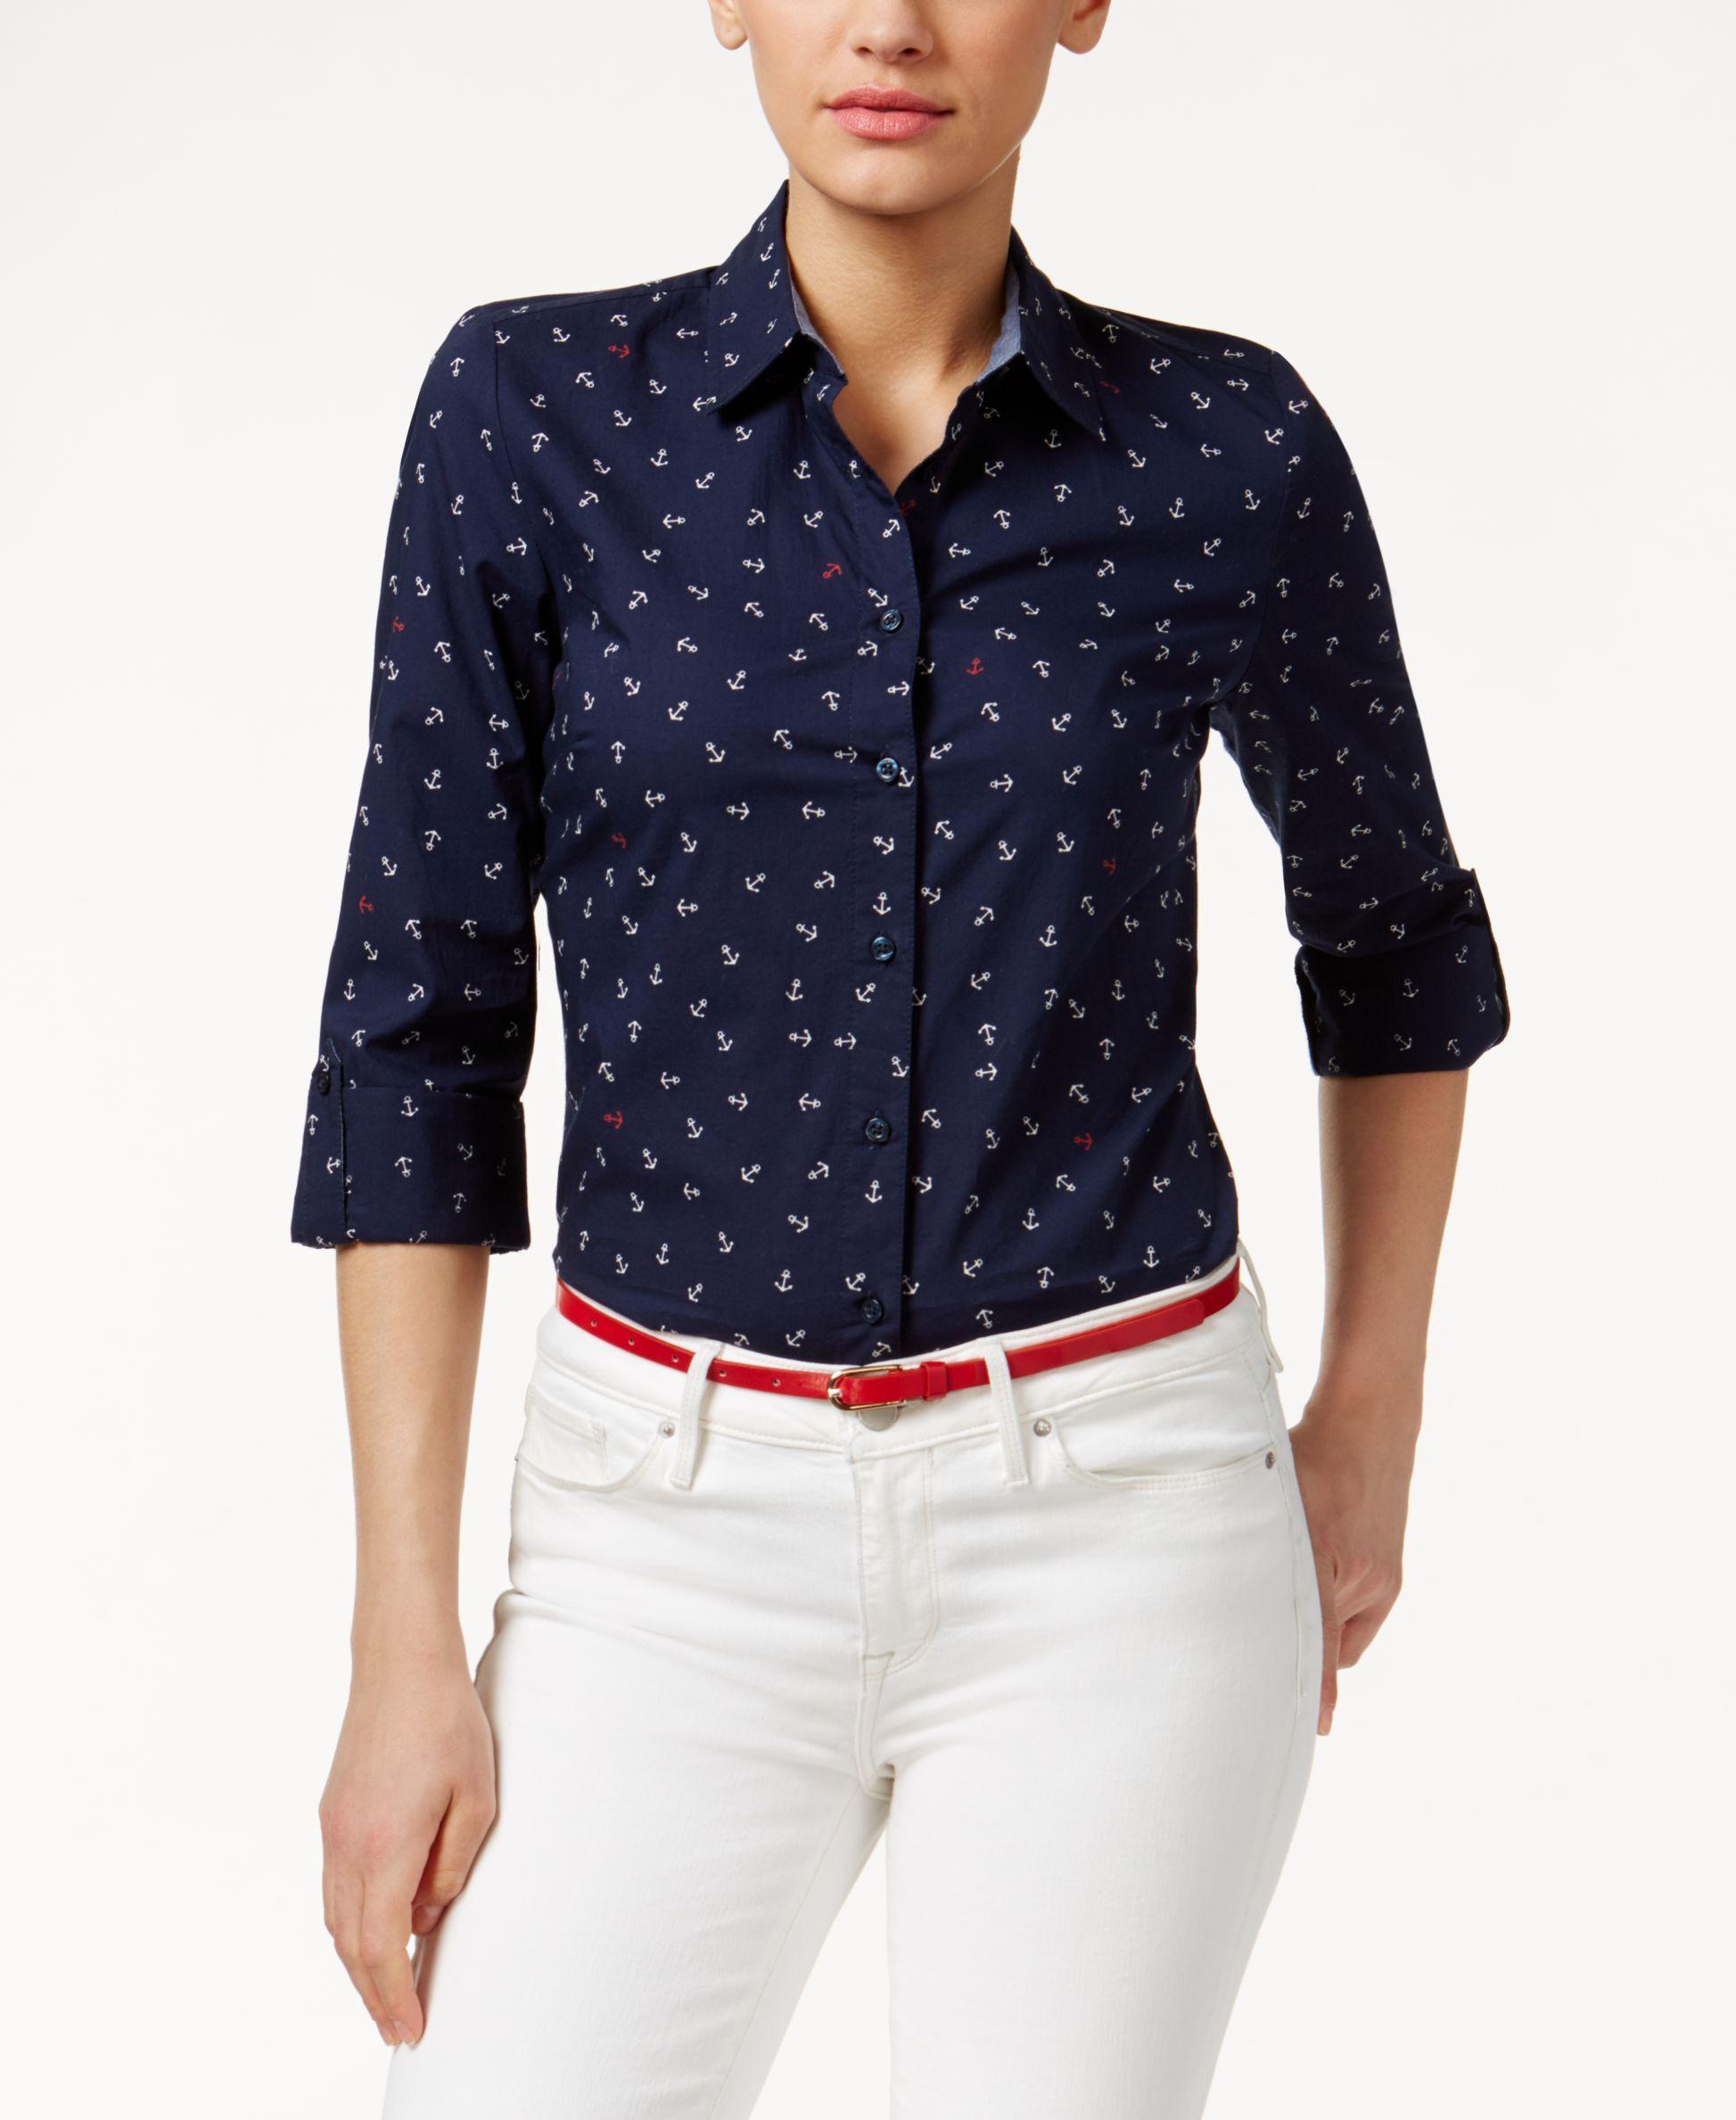 Tommy Hilfiger Anchor-Print Shirt Camisa Polo c8b0bda7c6835